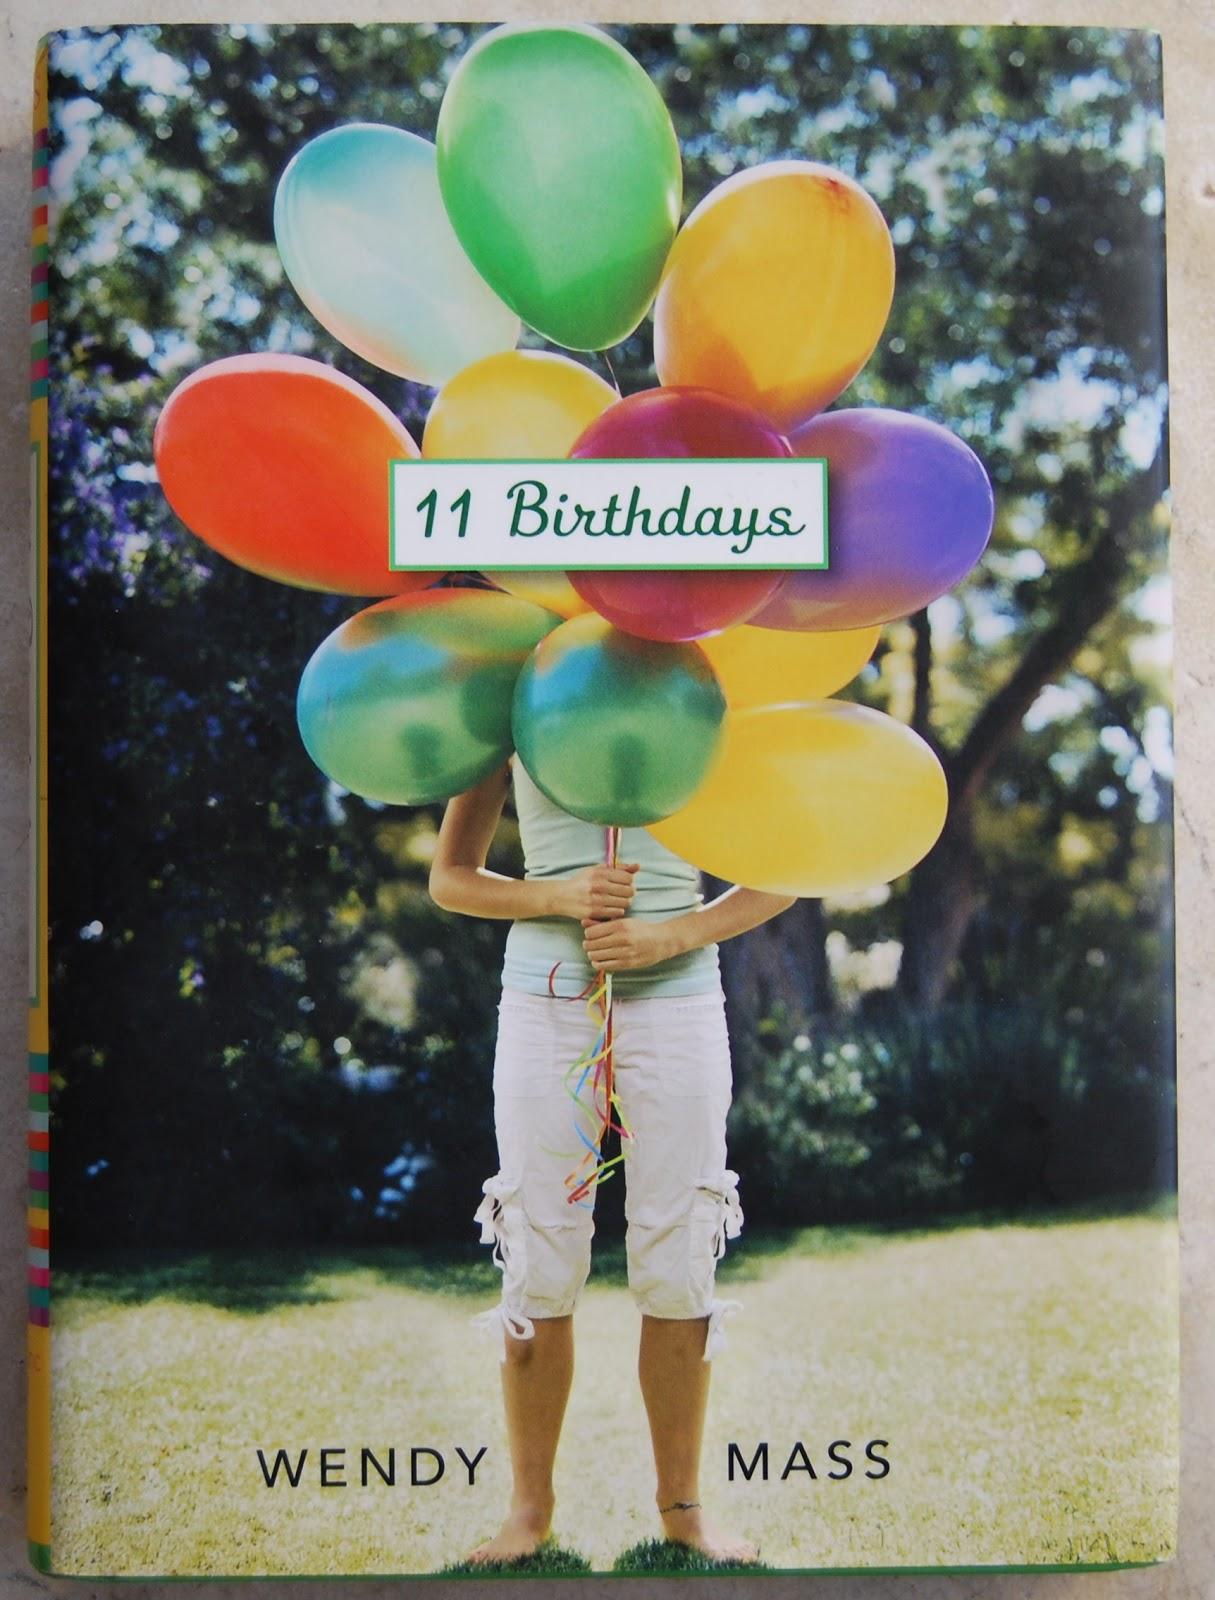 11 Birthdays Amanda And Leo Title: 11 birthdays